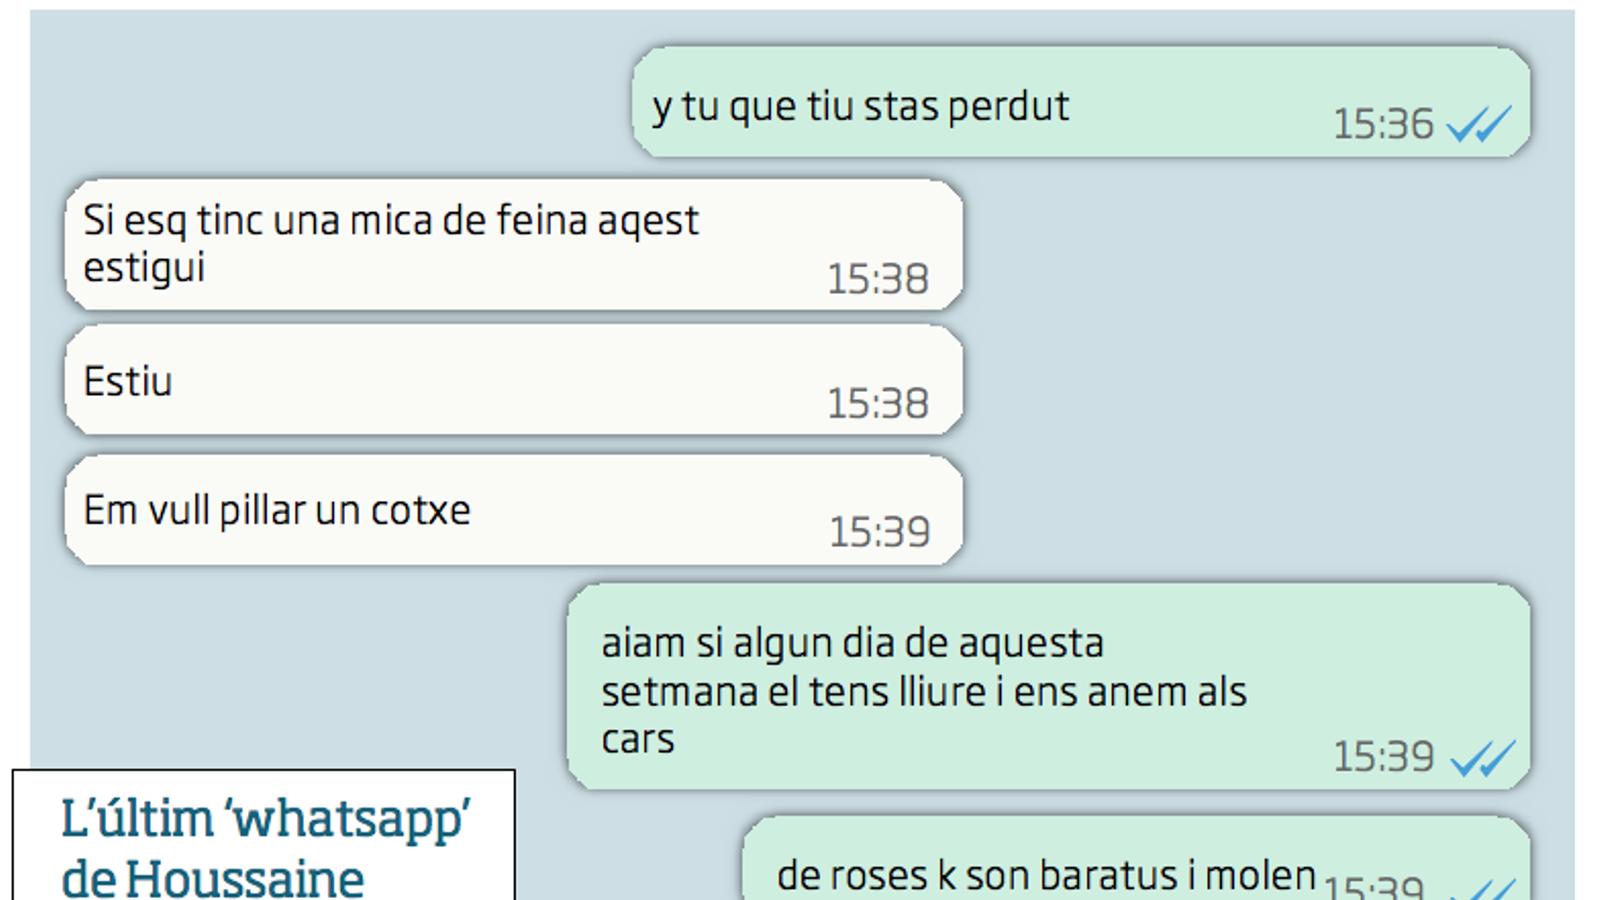 Intercanvi de Whatsapps entre Houssaine Abouyaaqoub i un amic